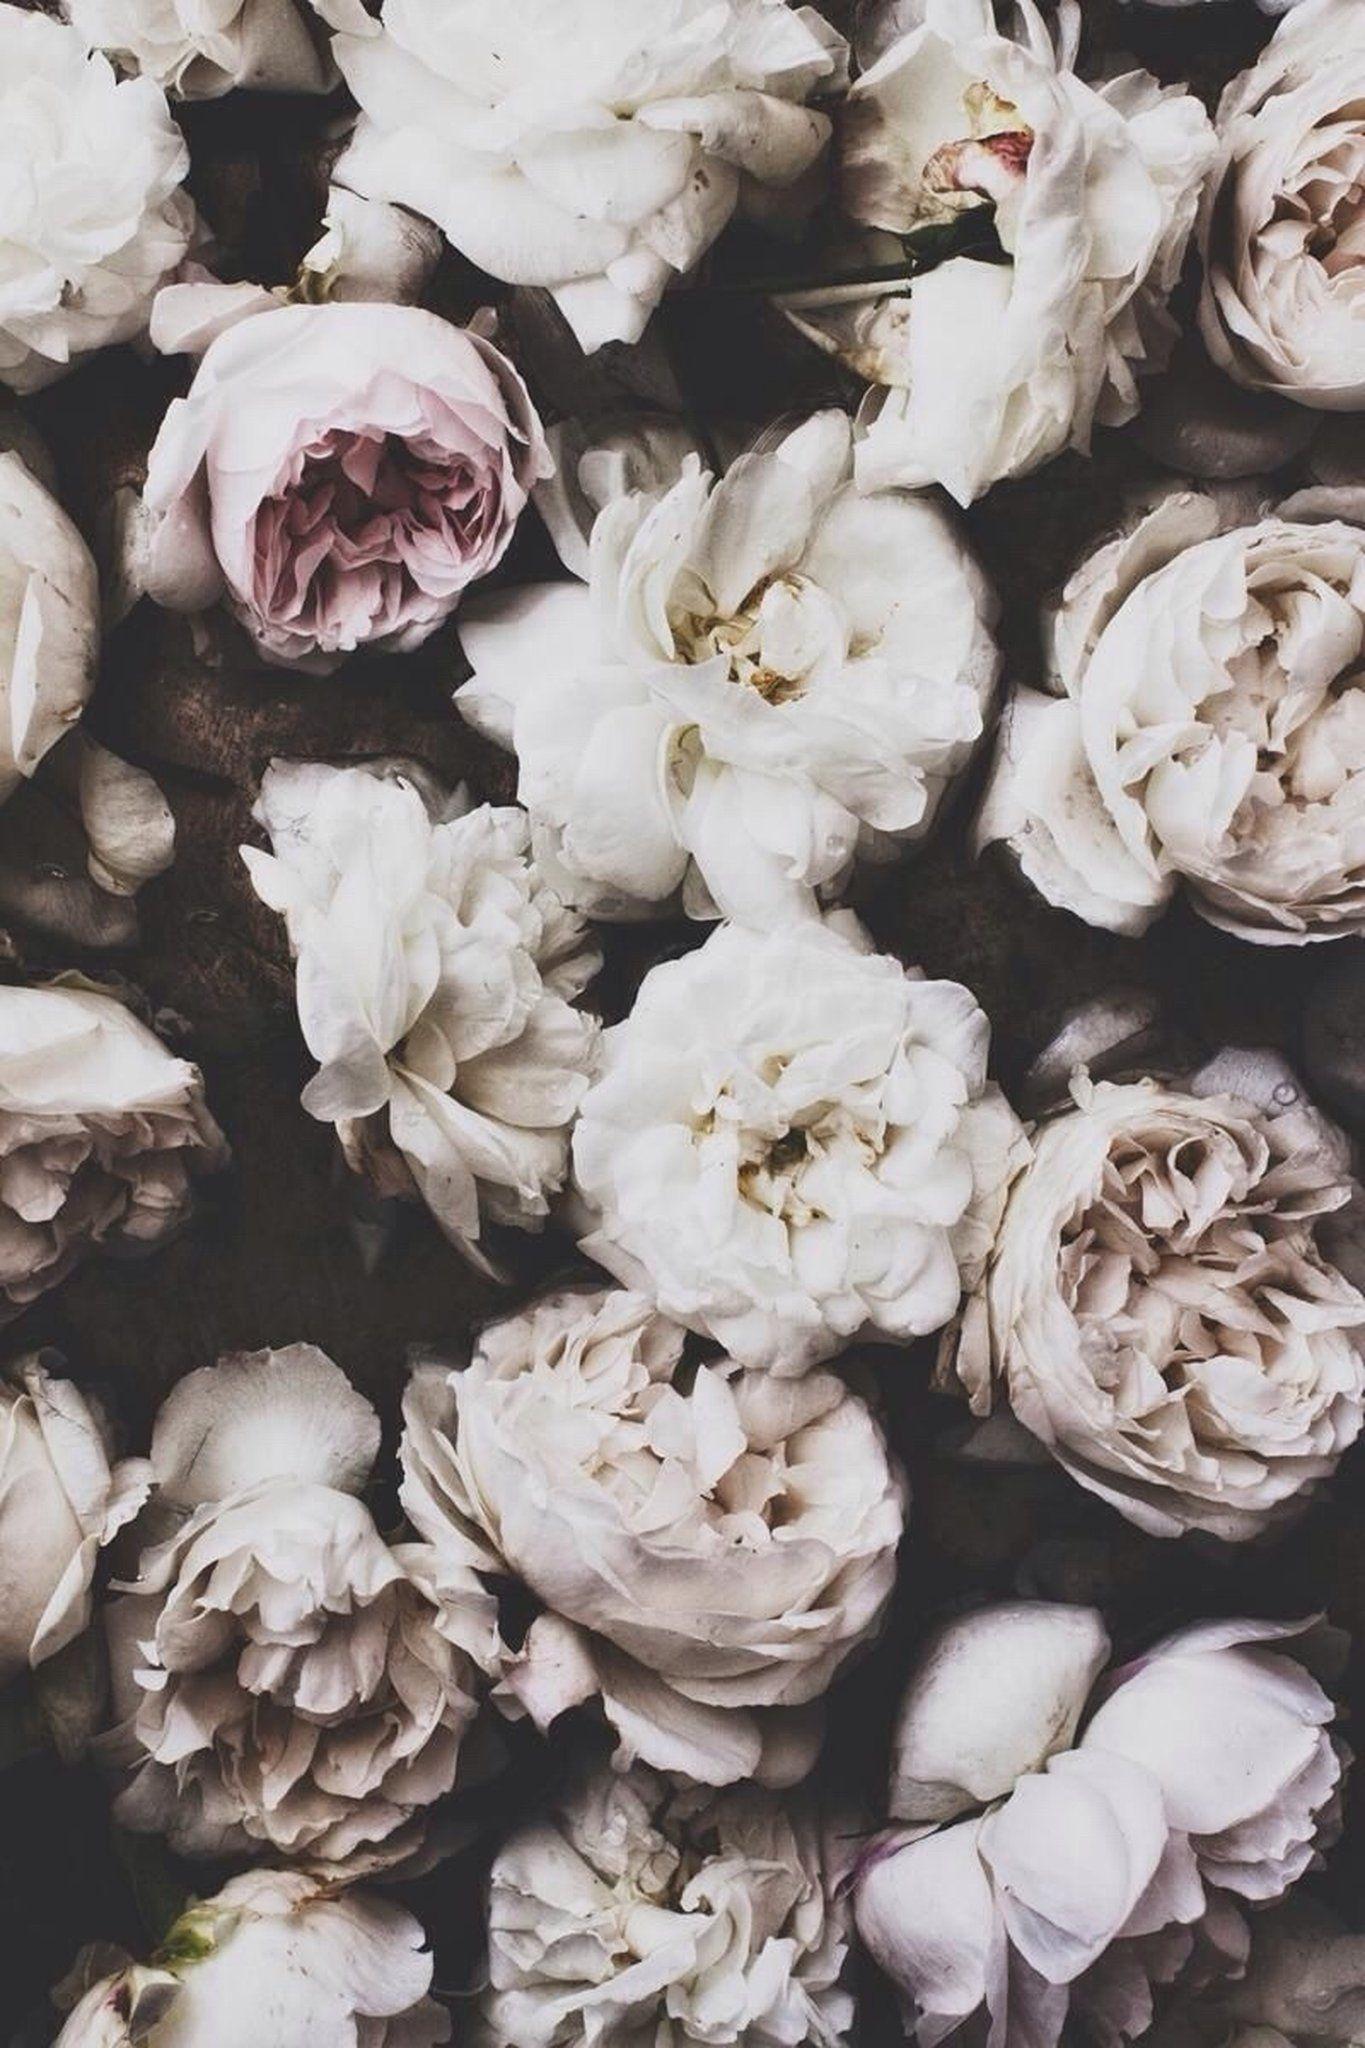 Iphone wallpaper tumblr flower - Cute Iphone Wallpaper Tumblr Google Search